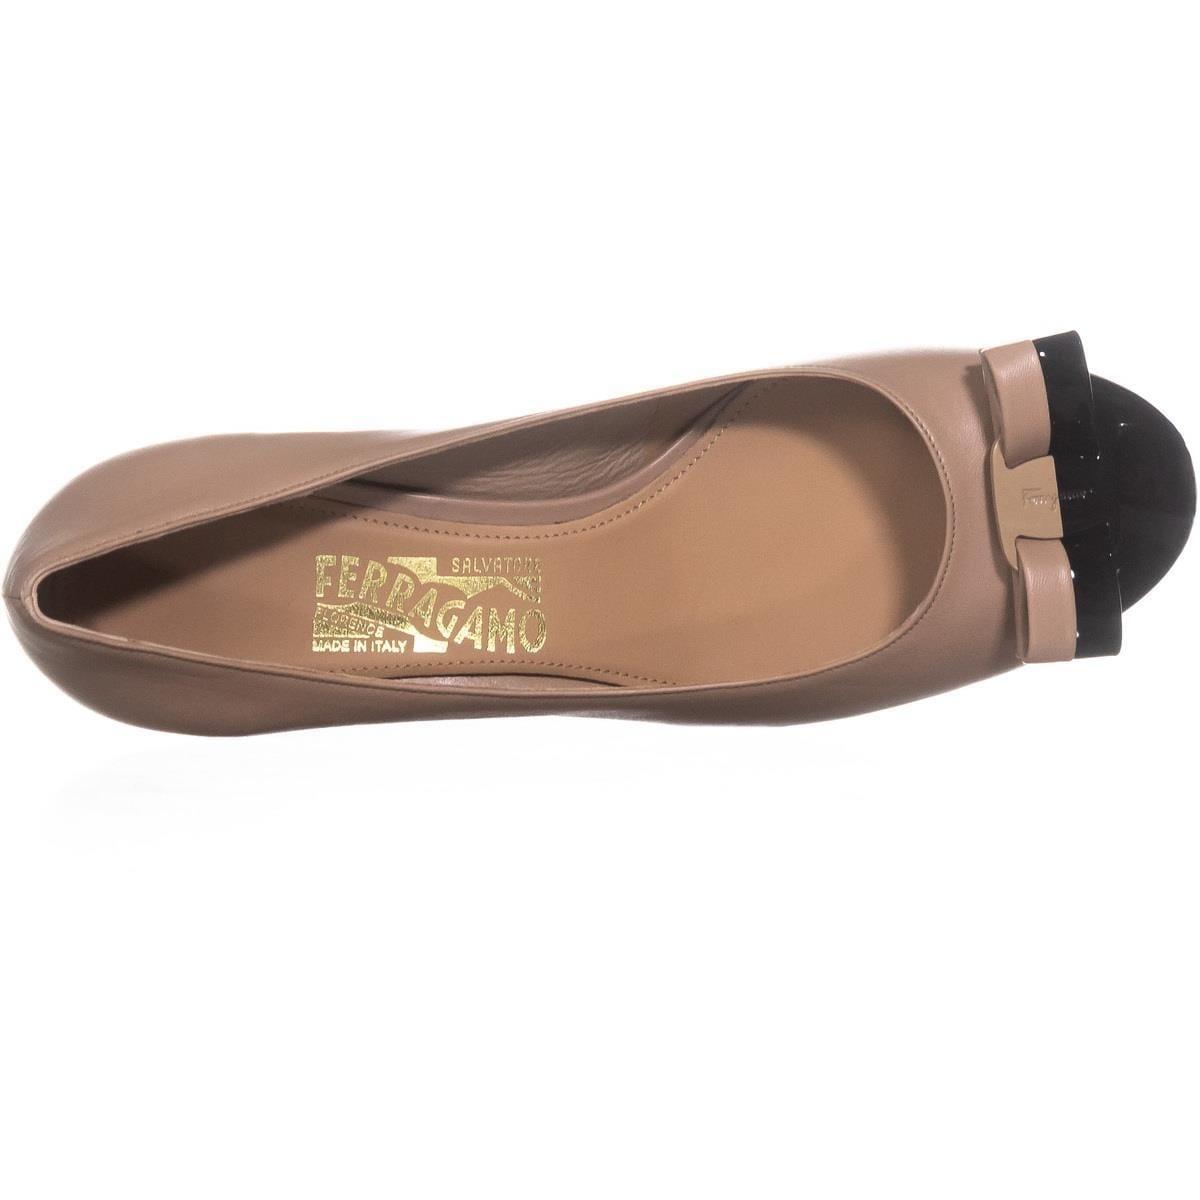 5c6d78f4a88 Shop Salvatore Ferragamo Elea Block Heel Pumps, Nero Patent - On Sale -  Free Shipping Today - Overstock - 22414513